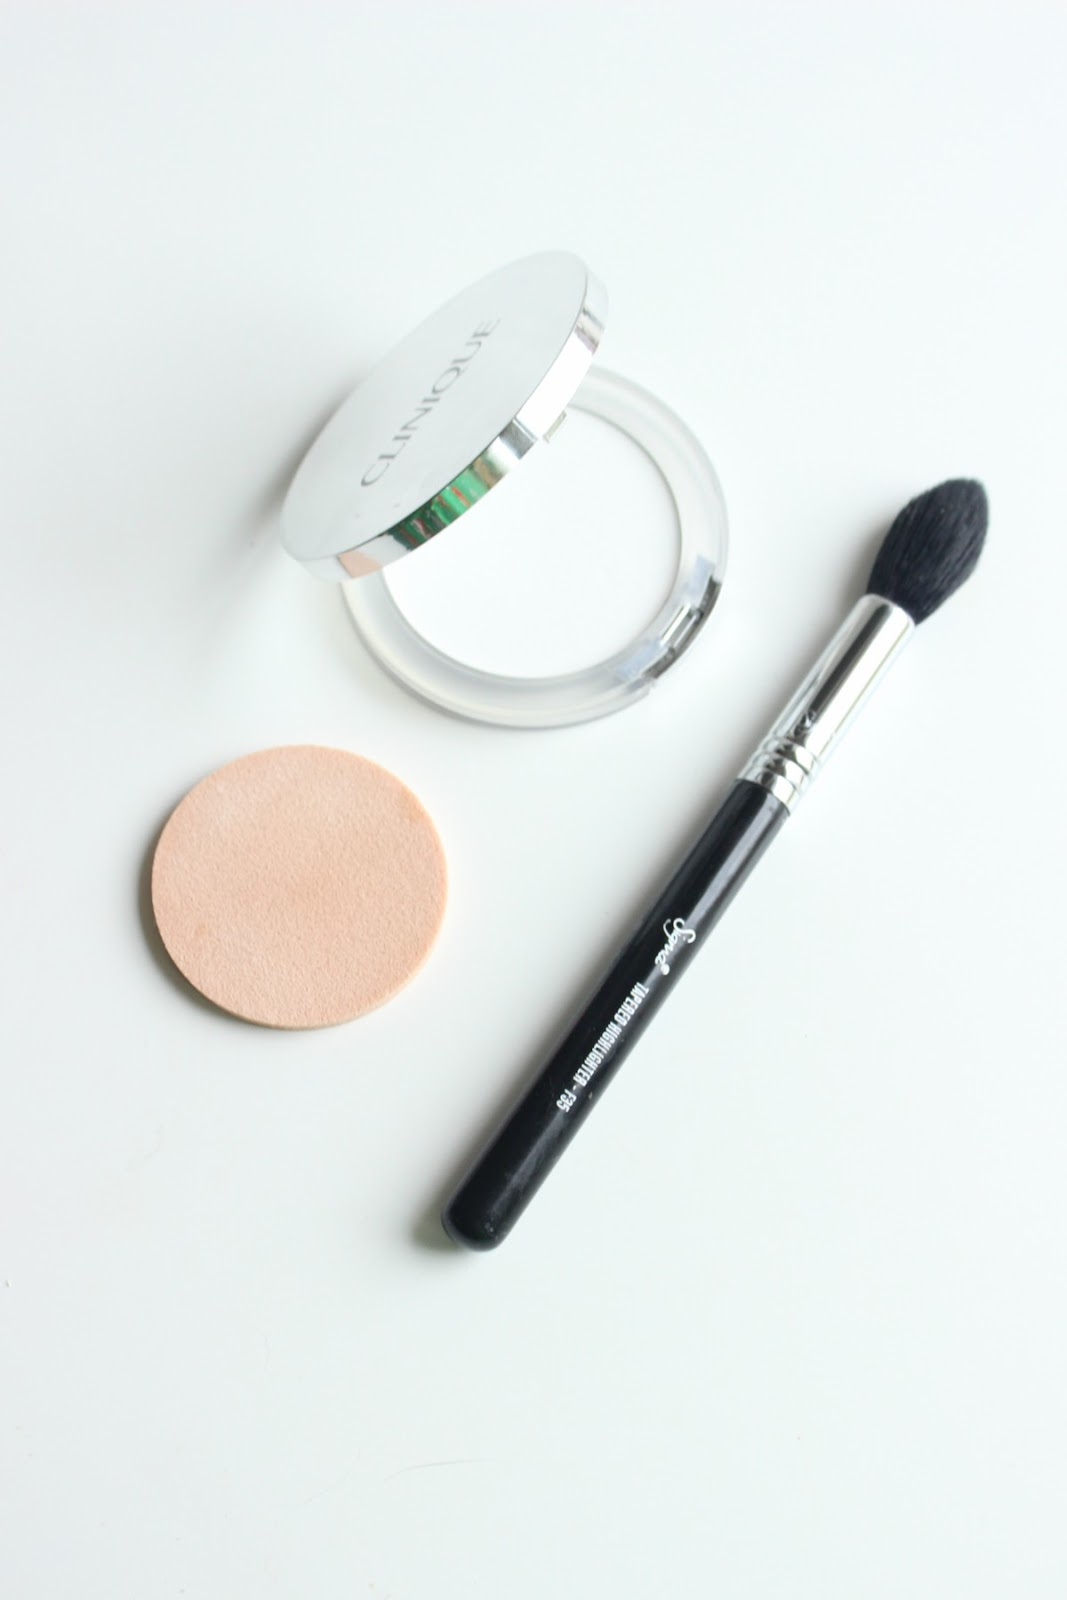 Clinique Stay-Matte Universal Blotting Powder